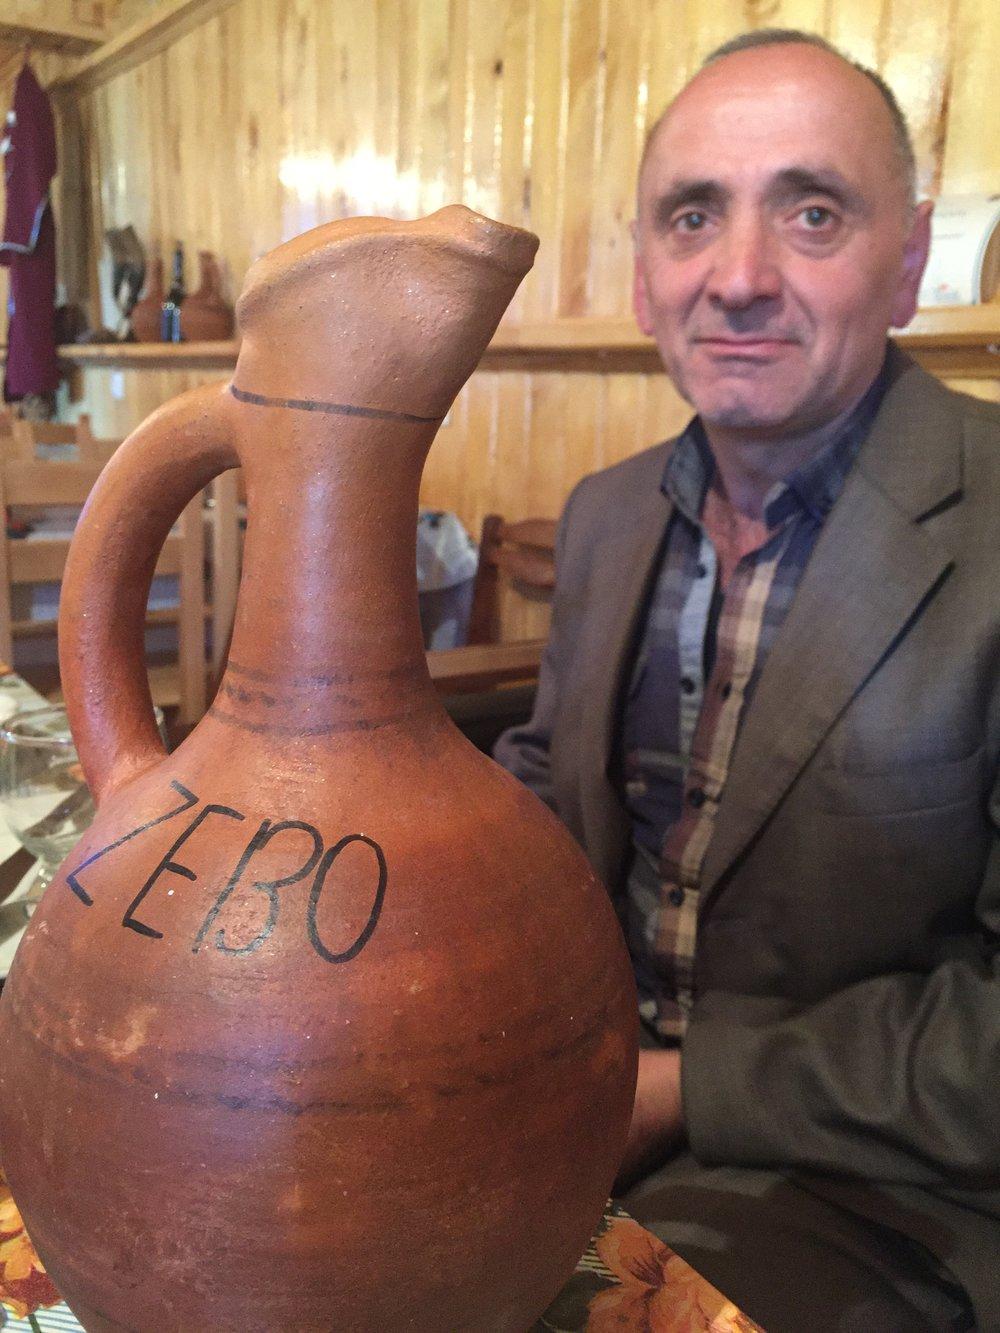 Our wonderful host, Zebo